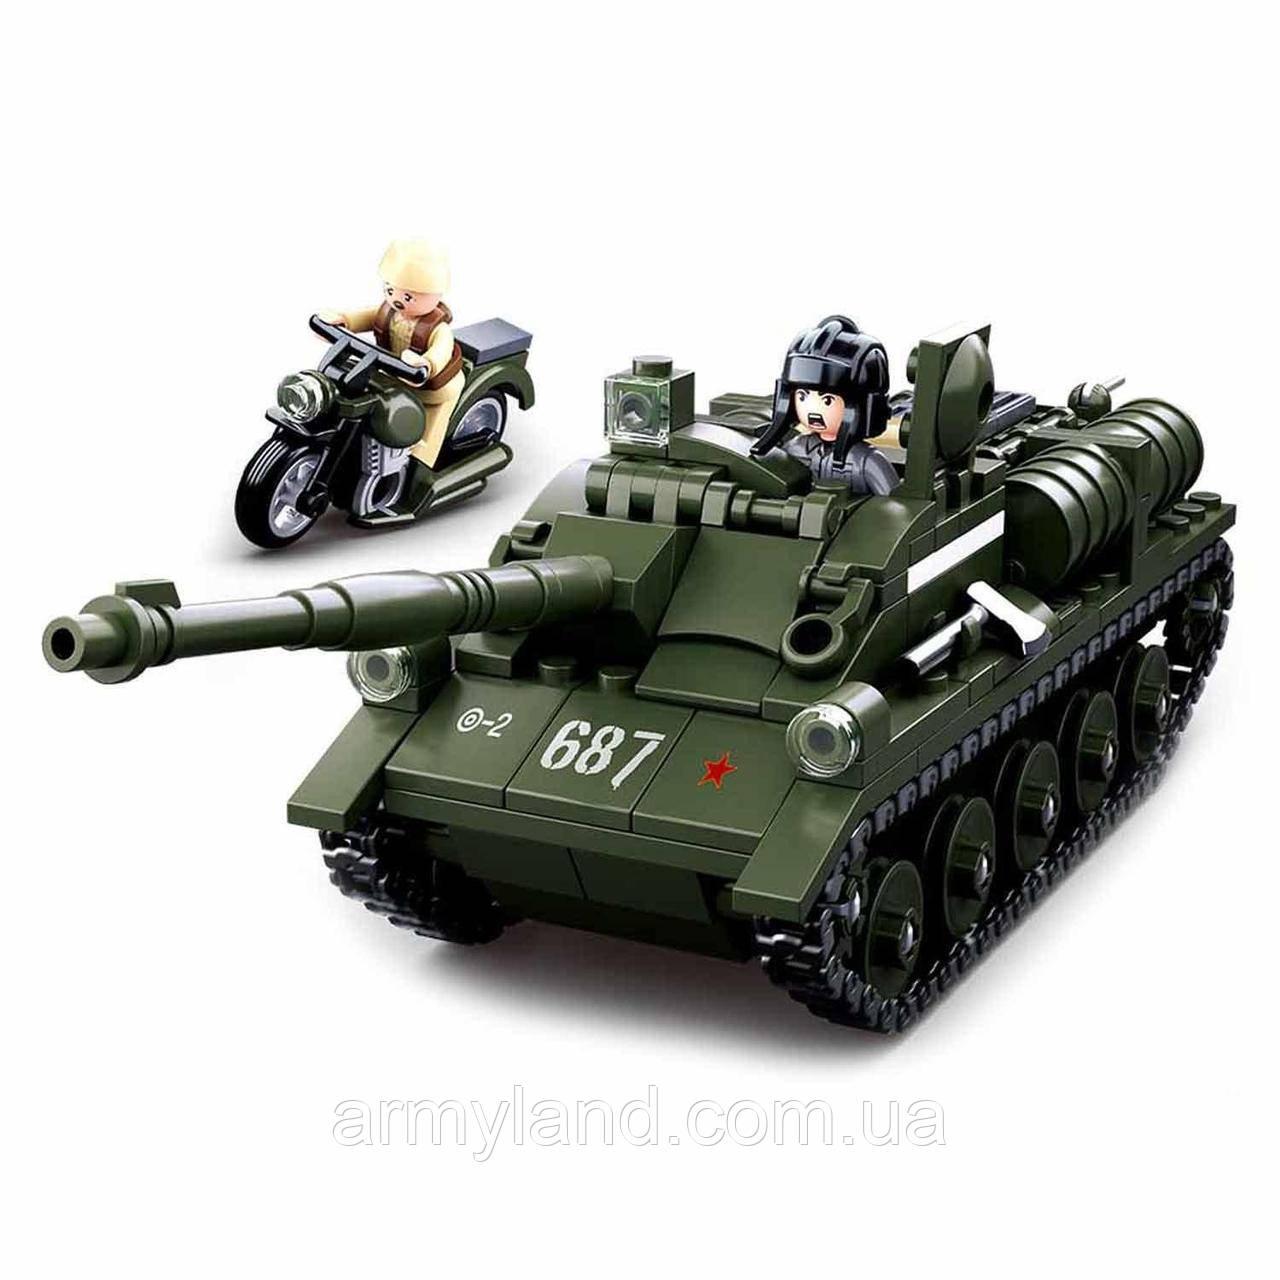 Конструктор ПТ-САУ Танк СУ-85